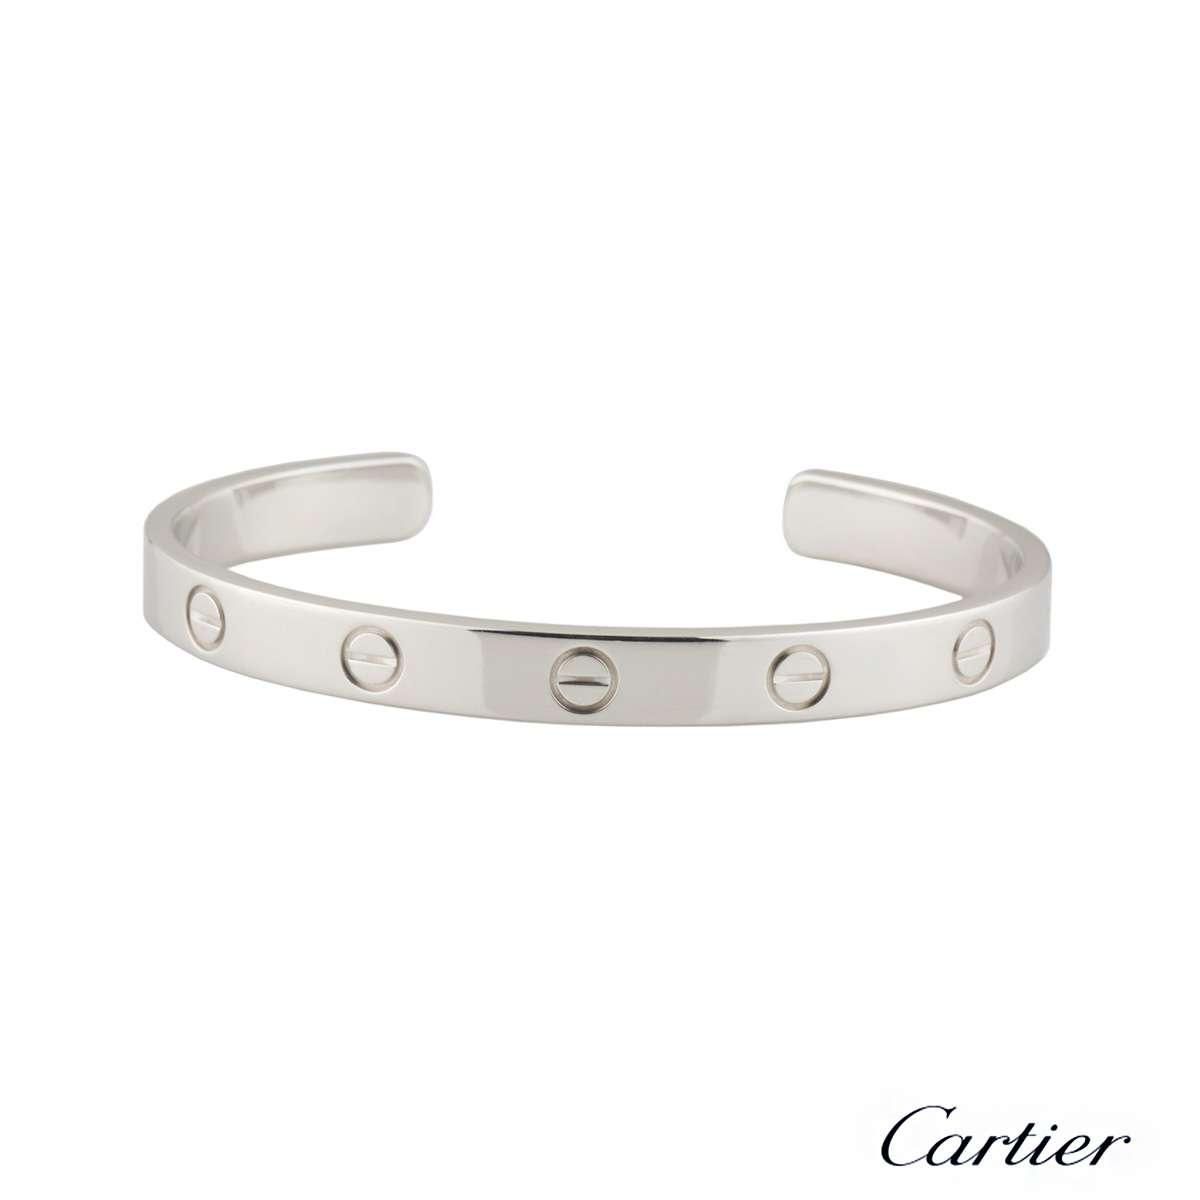 Cartier White Gold Love Cuff Bracelet Size 20 B6032520